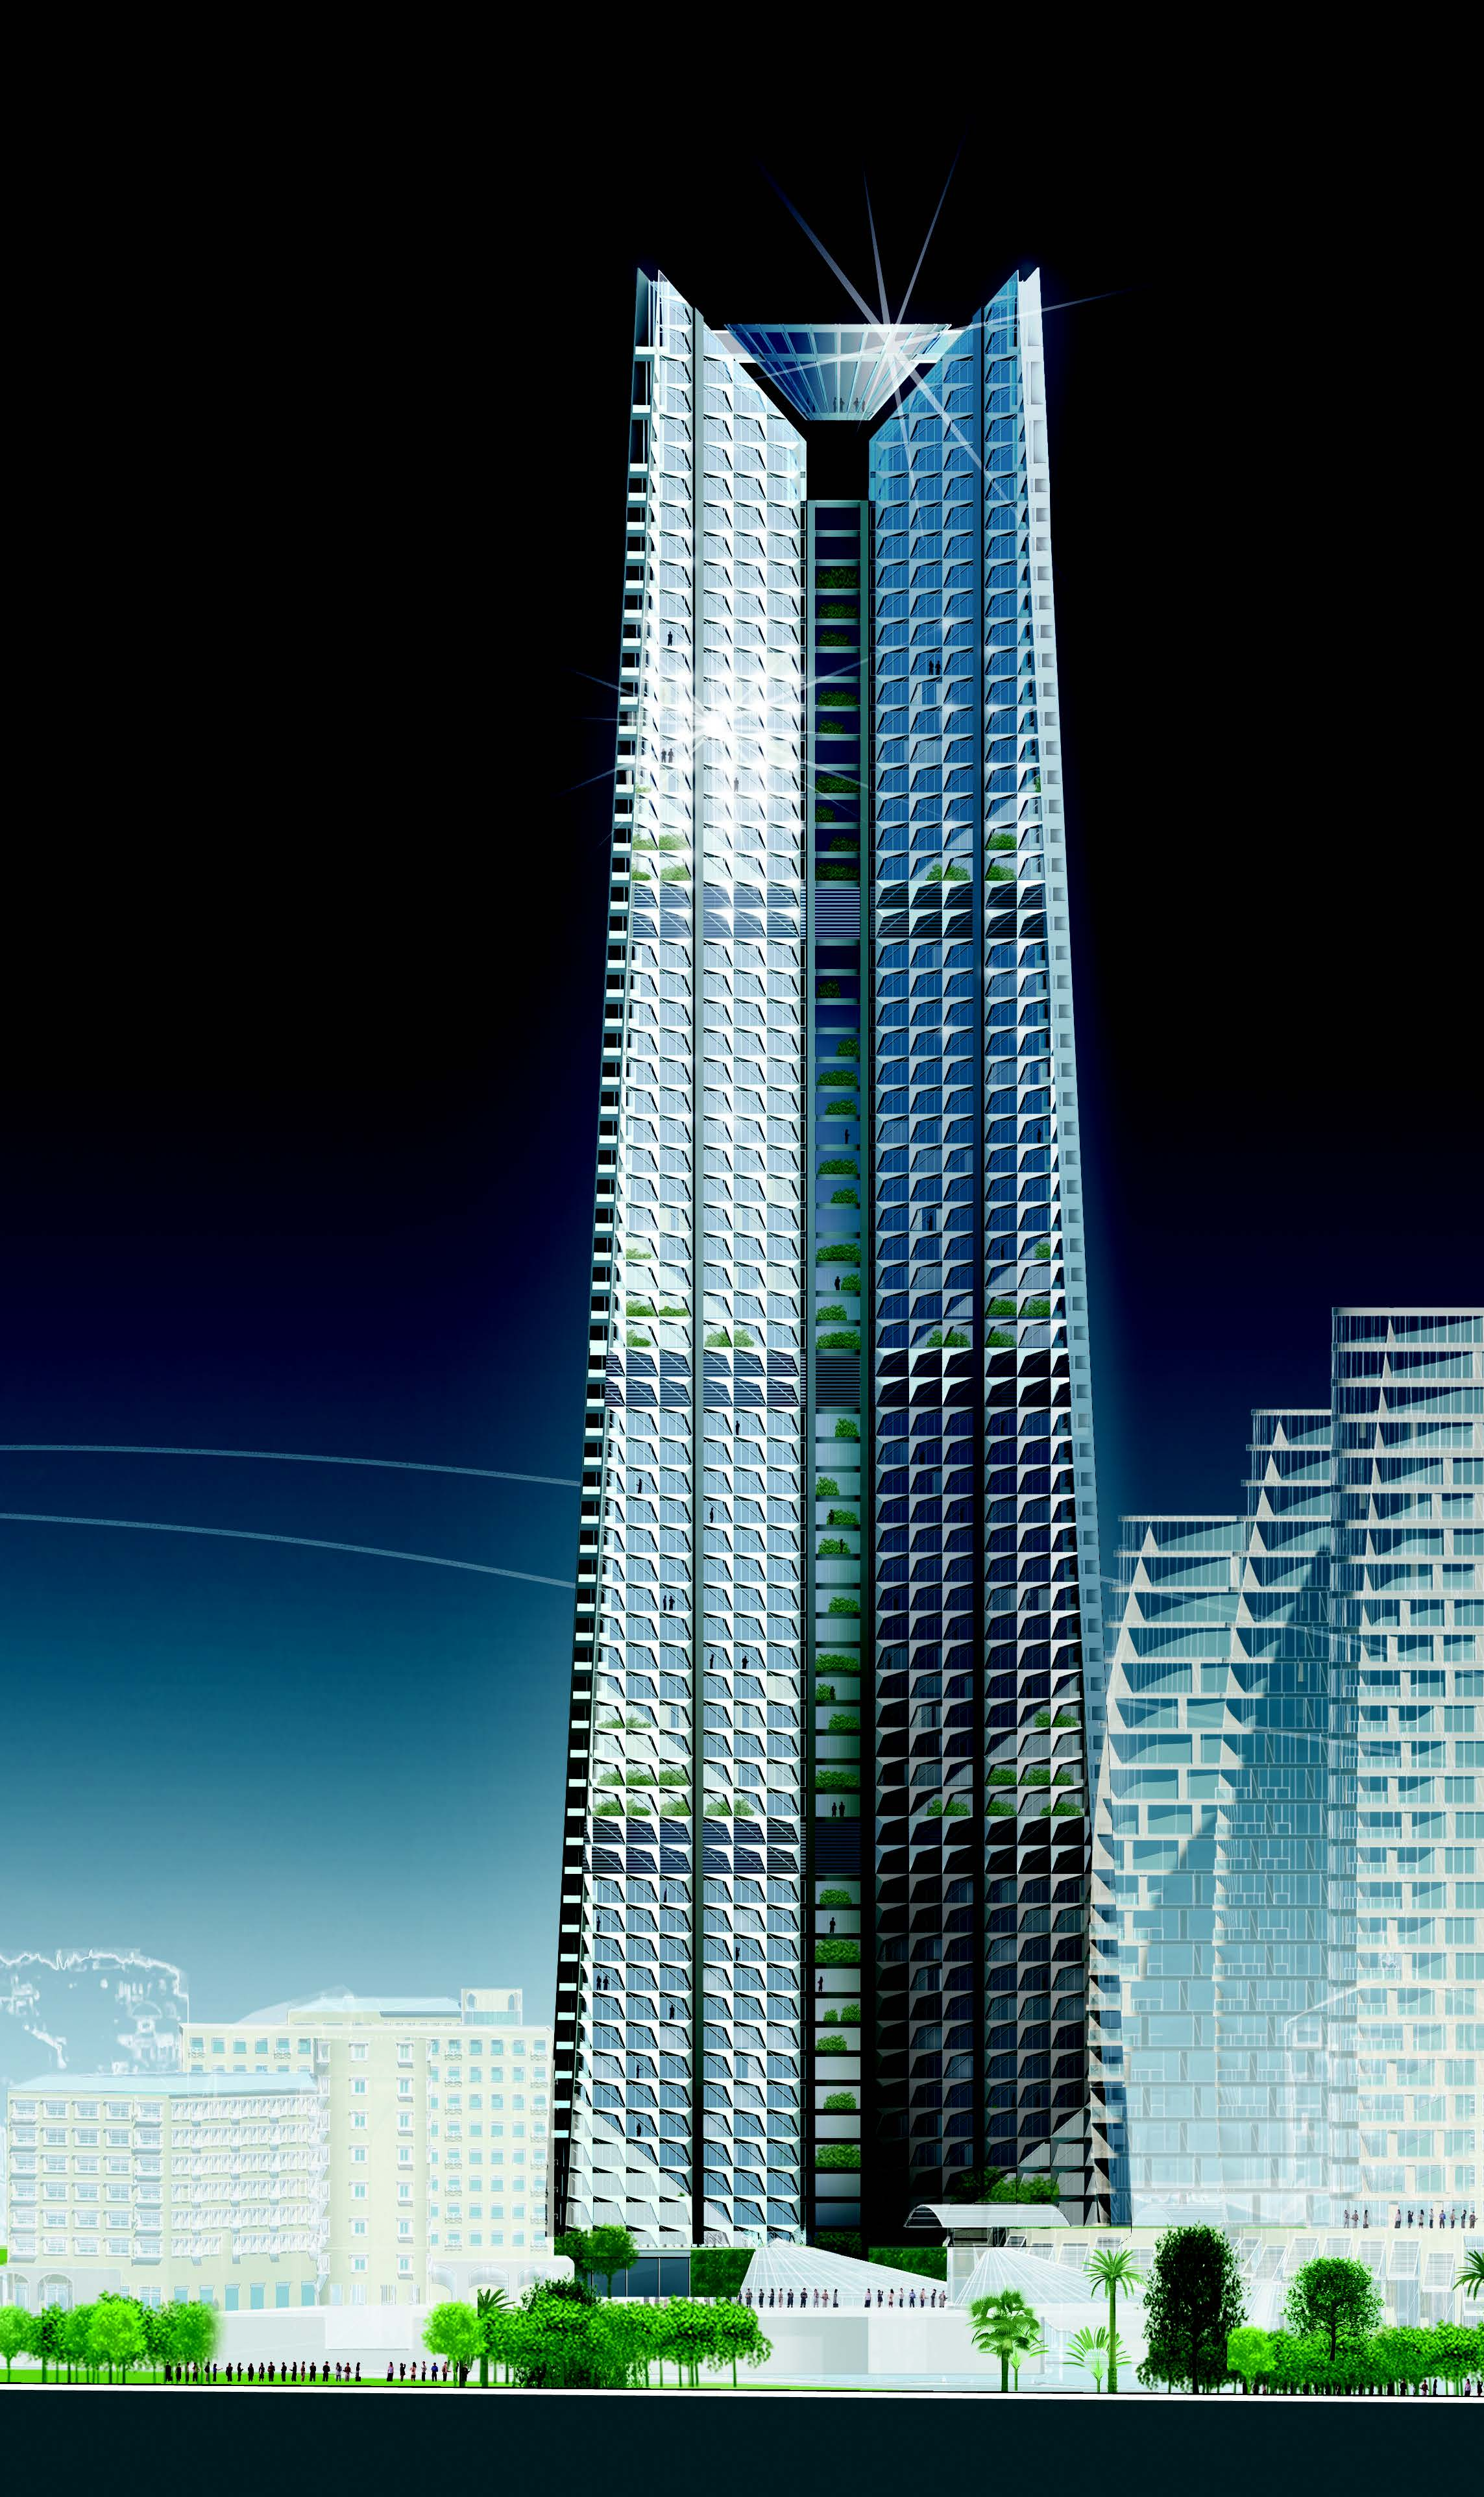 09-03-27_Final_Concept_Design_Report23